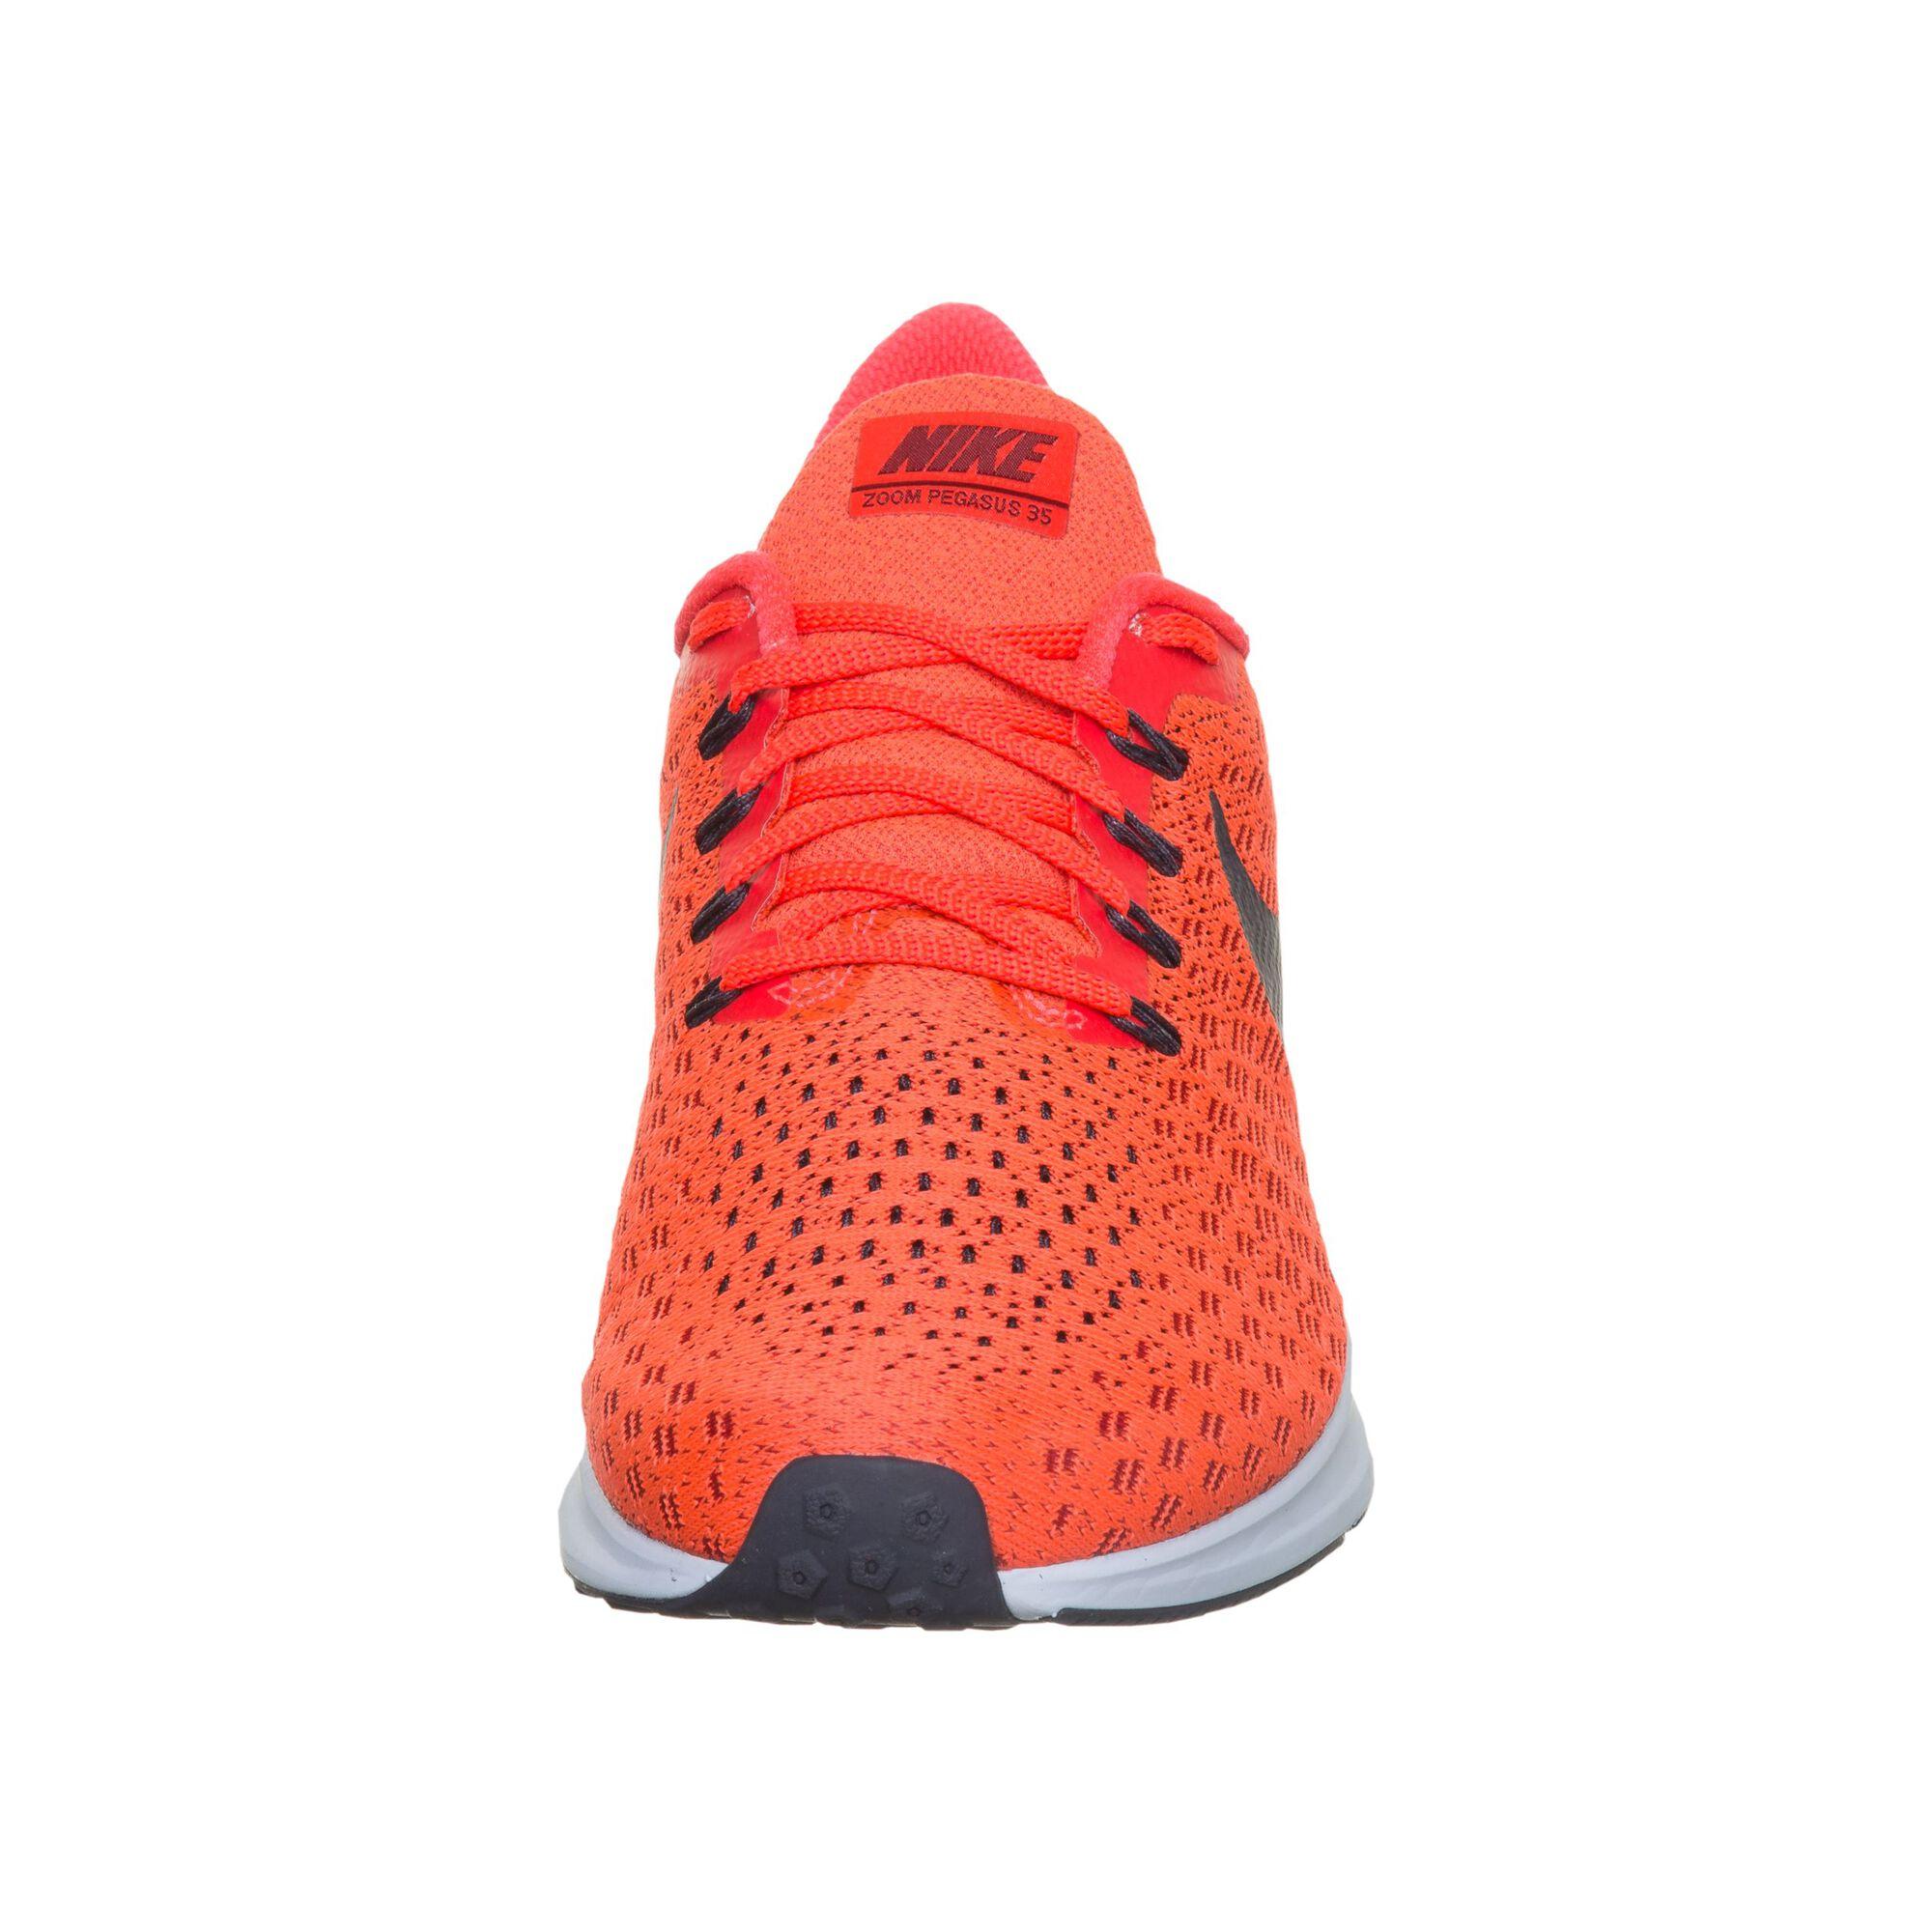 962ba210e958 buy Nike Air Zoom Pegasus 35 Neutral Running Shoe Men - Orange ...